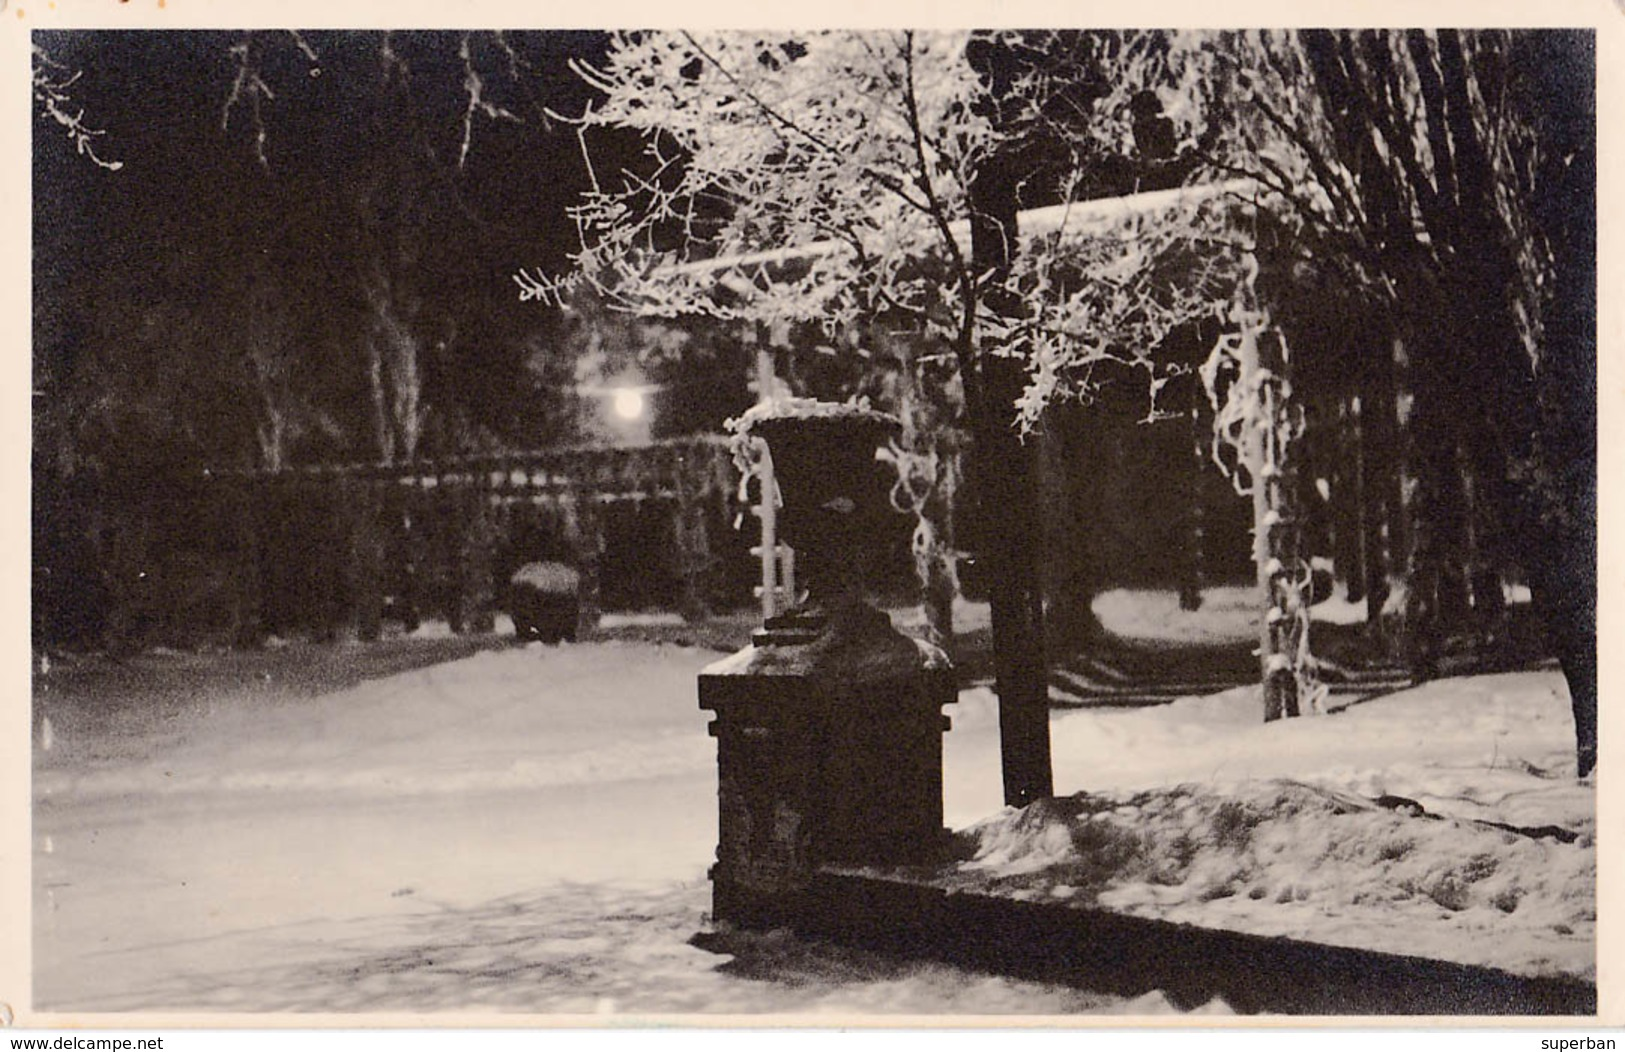 BASARABIA : CHISINAU / KISHINEV / KICHINEW : GRADINA PUBLICA - CARTE VRAIE PHOTO / REAL PHOTO ~ 1935 - '38 - RRR (ab766) - Moldavie